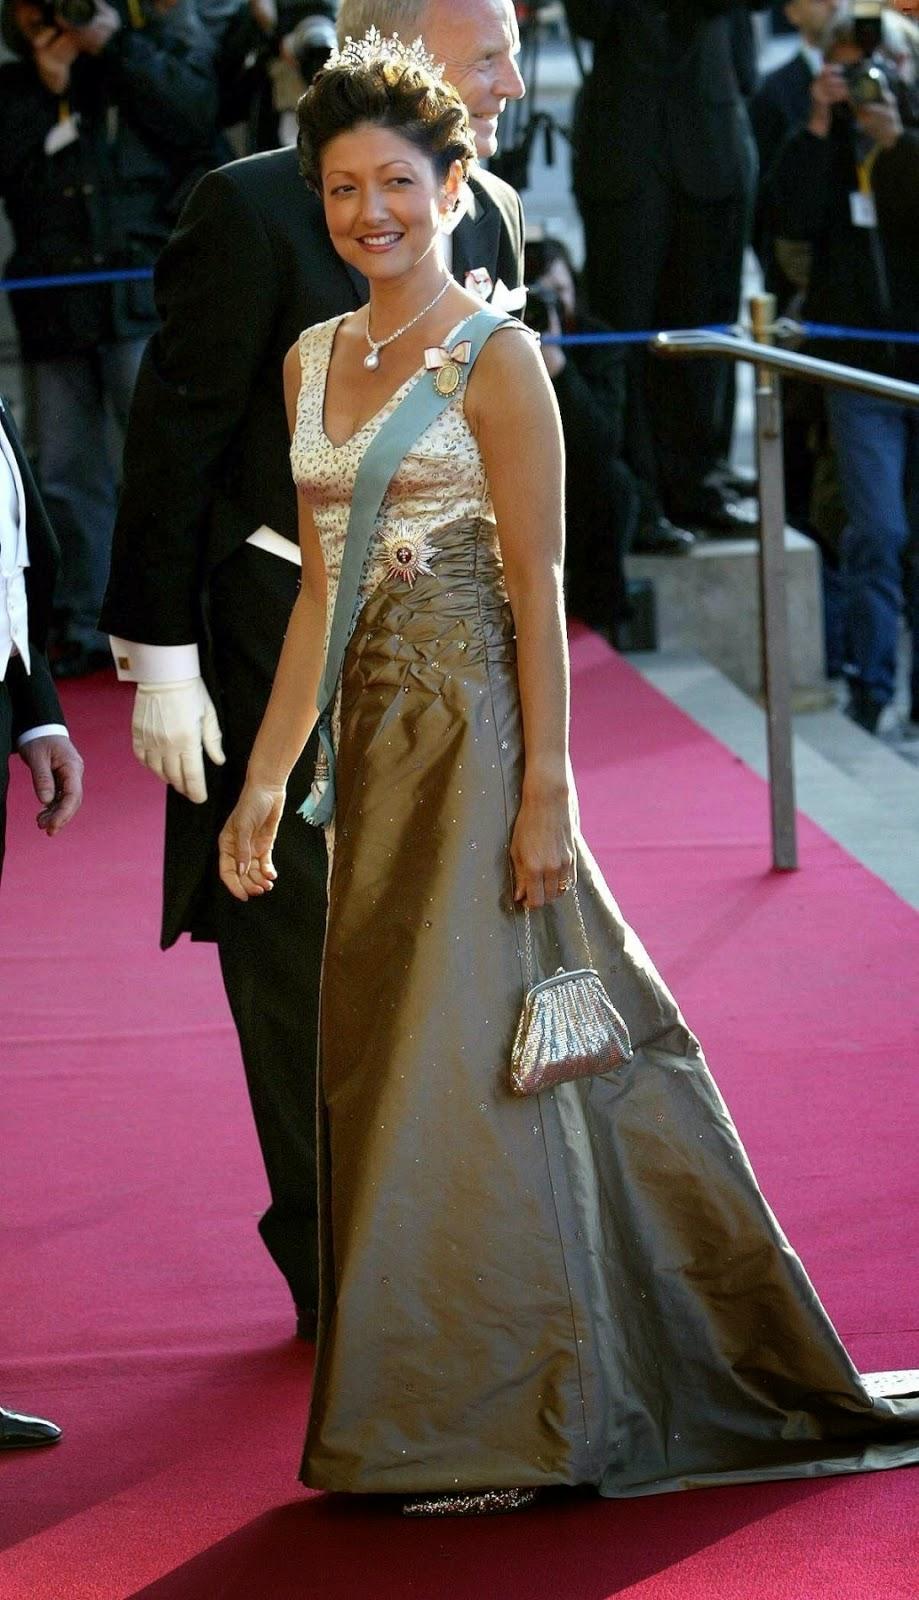 Princess mary wedding dress denmark – Step 1 dresses